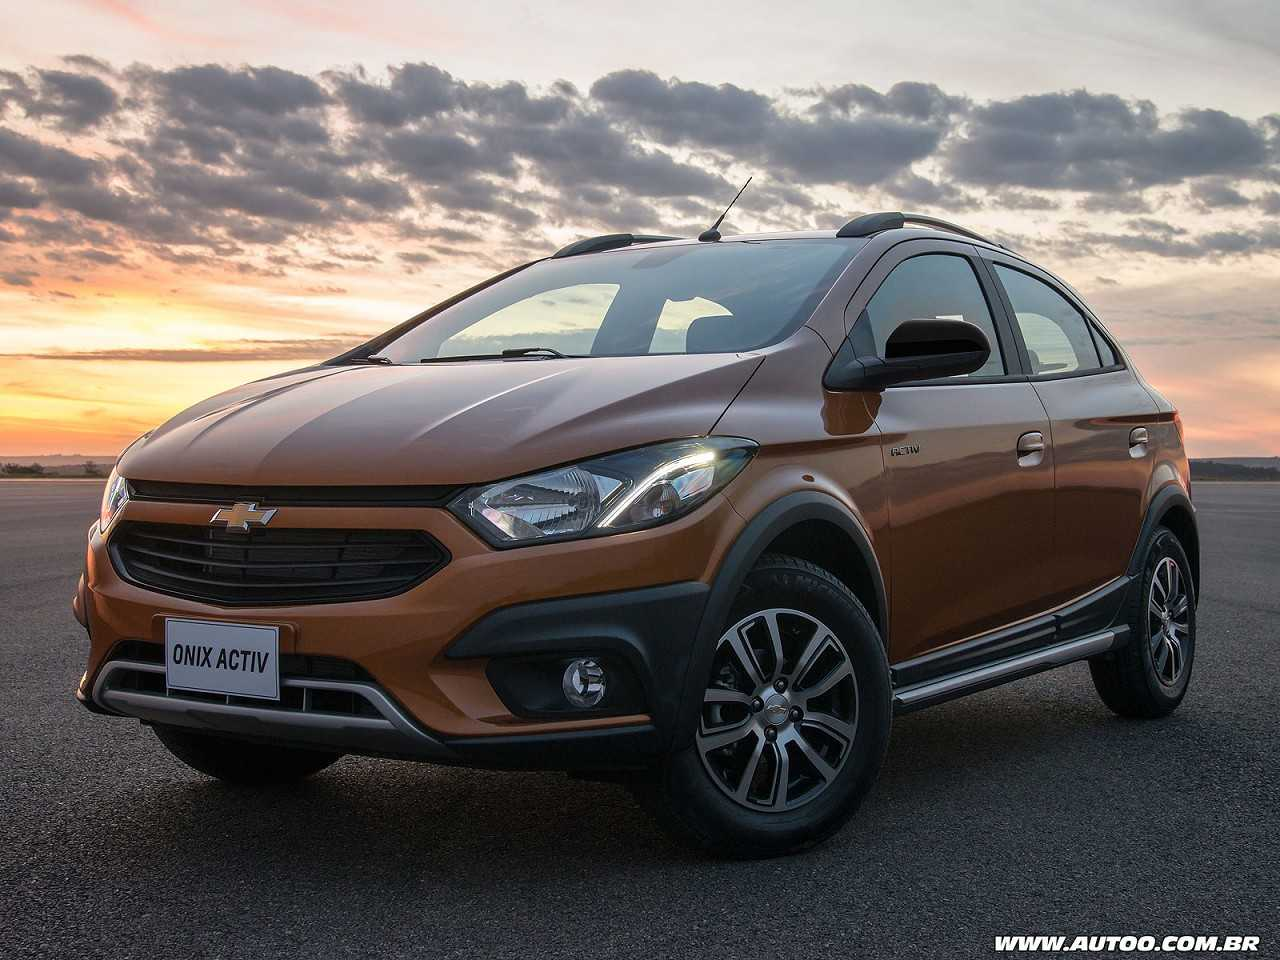 ChevroletOnix 2017 - ângulo frontal